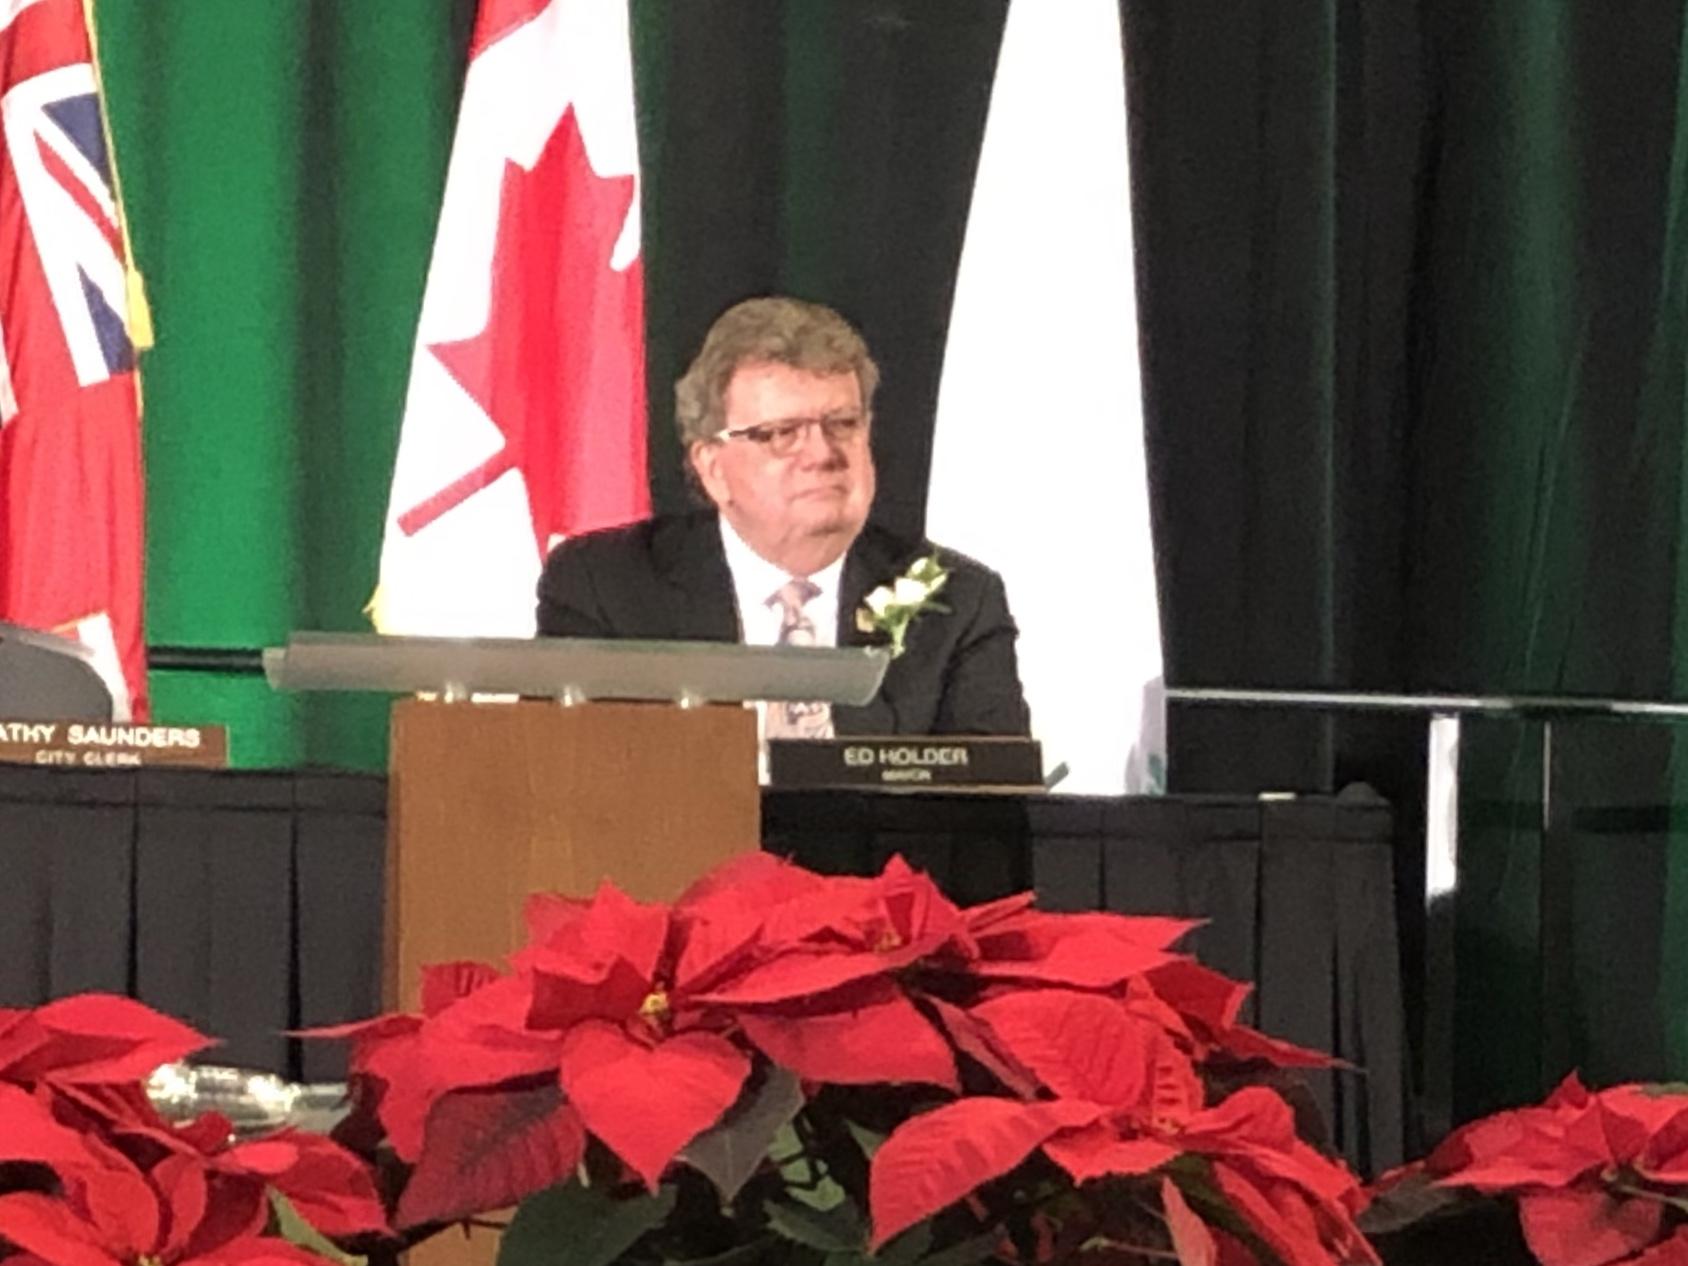 City council: the beginning of a new era